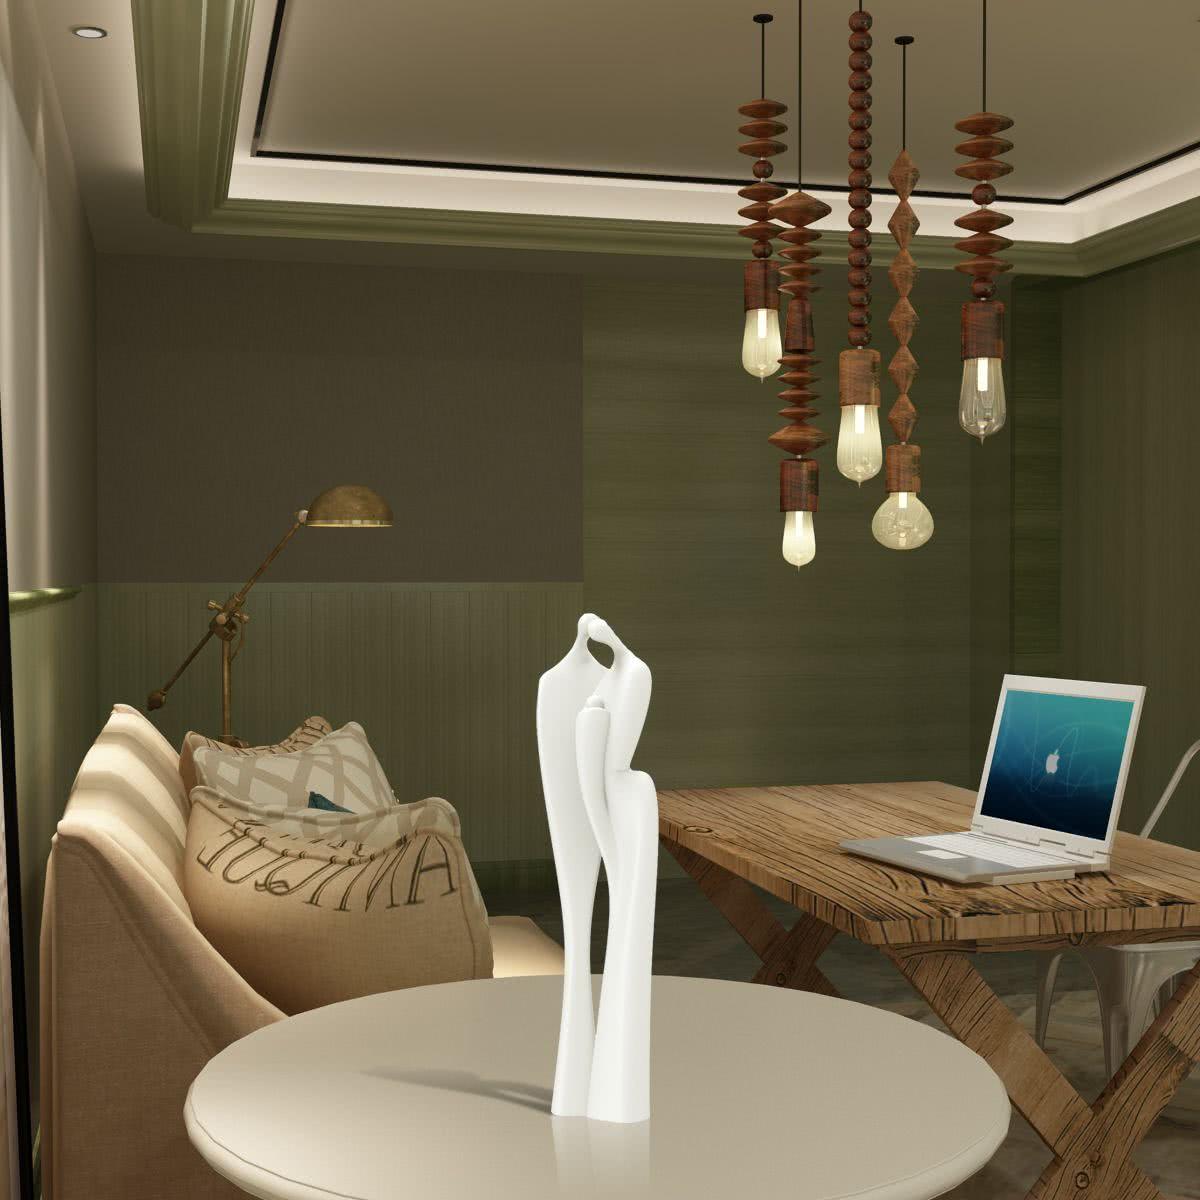 Reci n nacido la mano sostiene la escultura 3d tomfeel for Decoracion hogar 3d